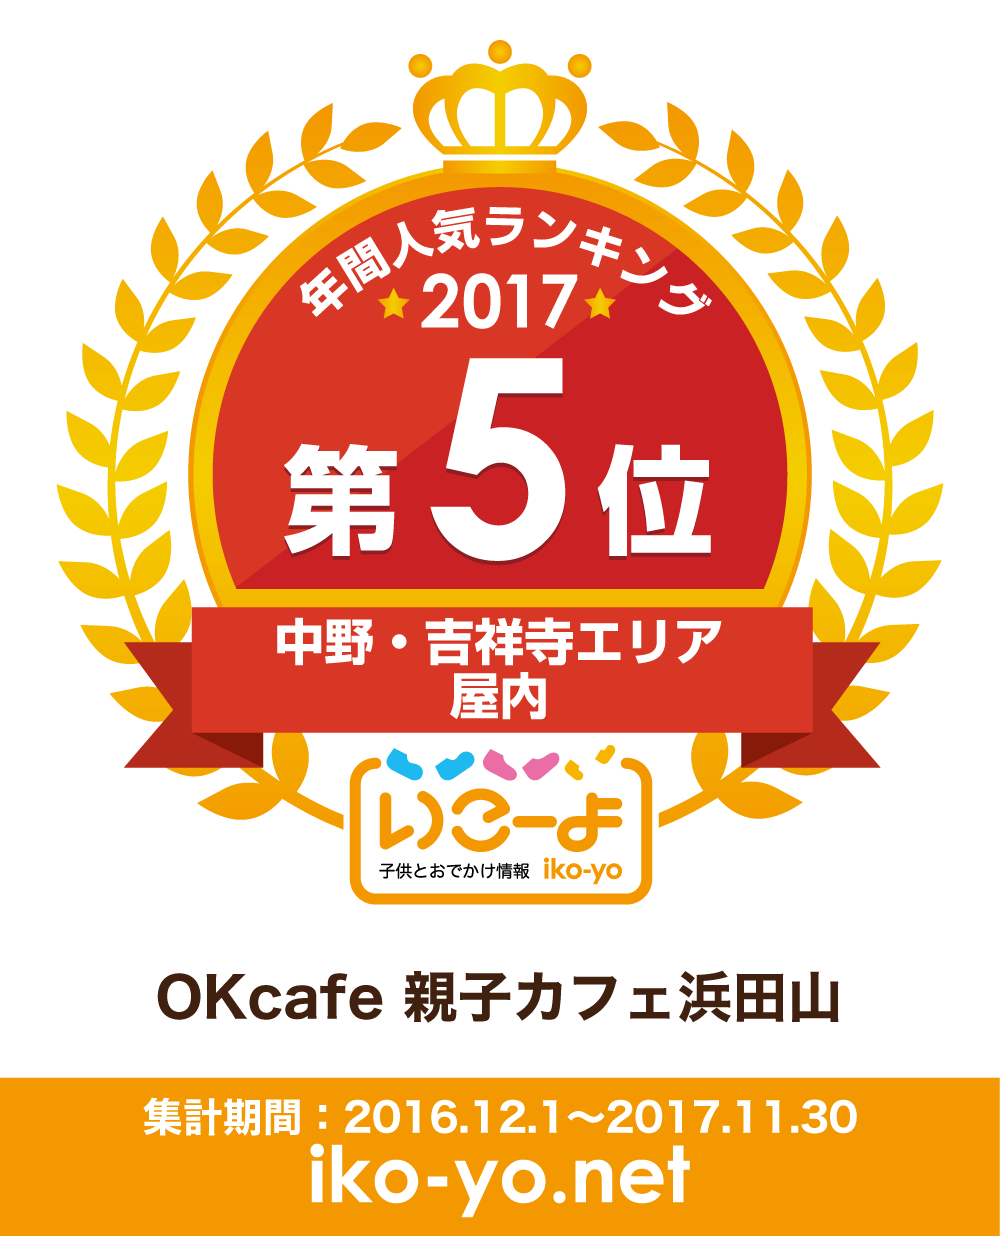 【OKcafe-親子カフェ浜田山】中野・吉祥寺エリア_屋内_5.png